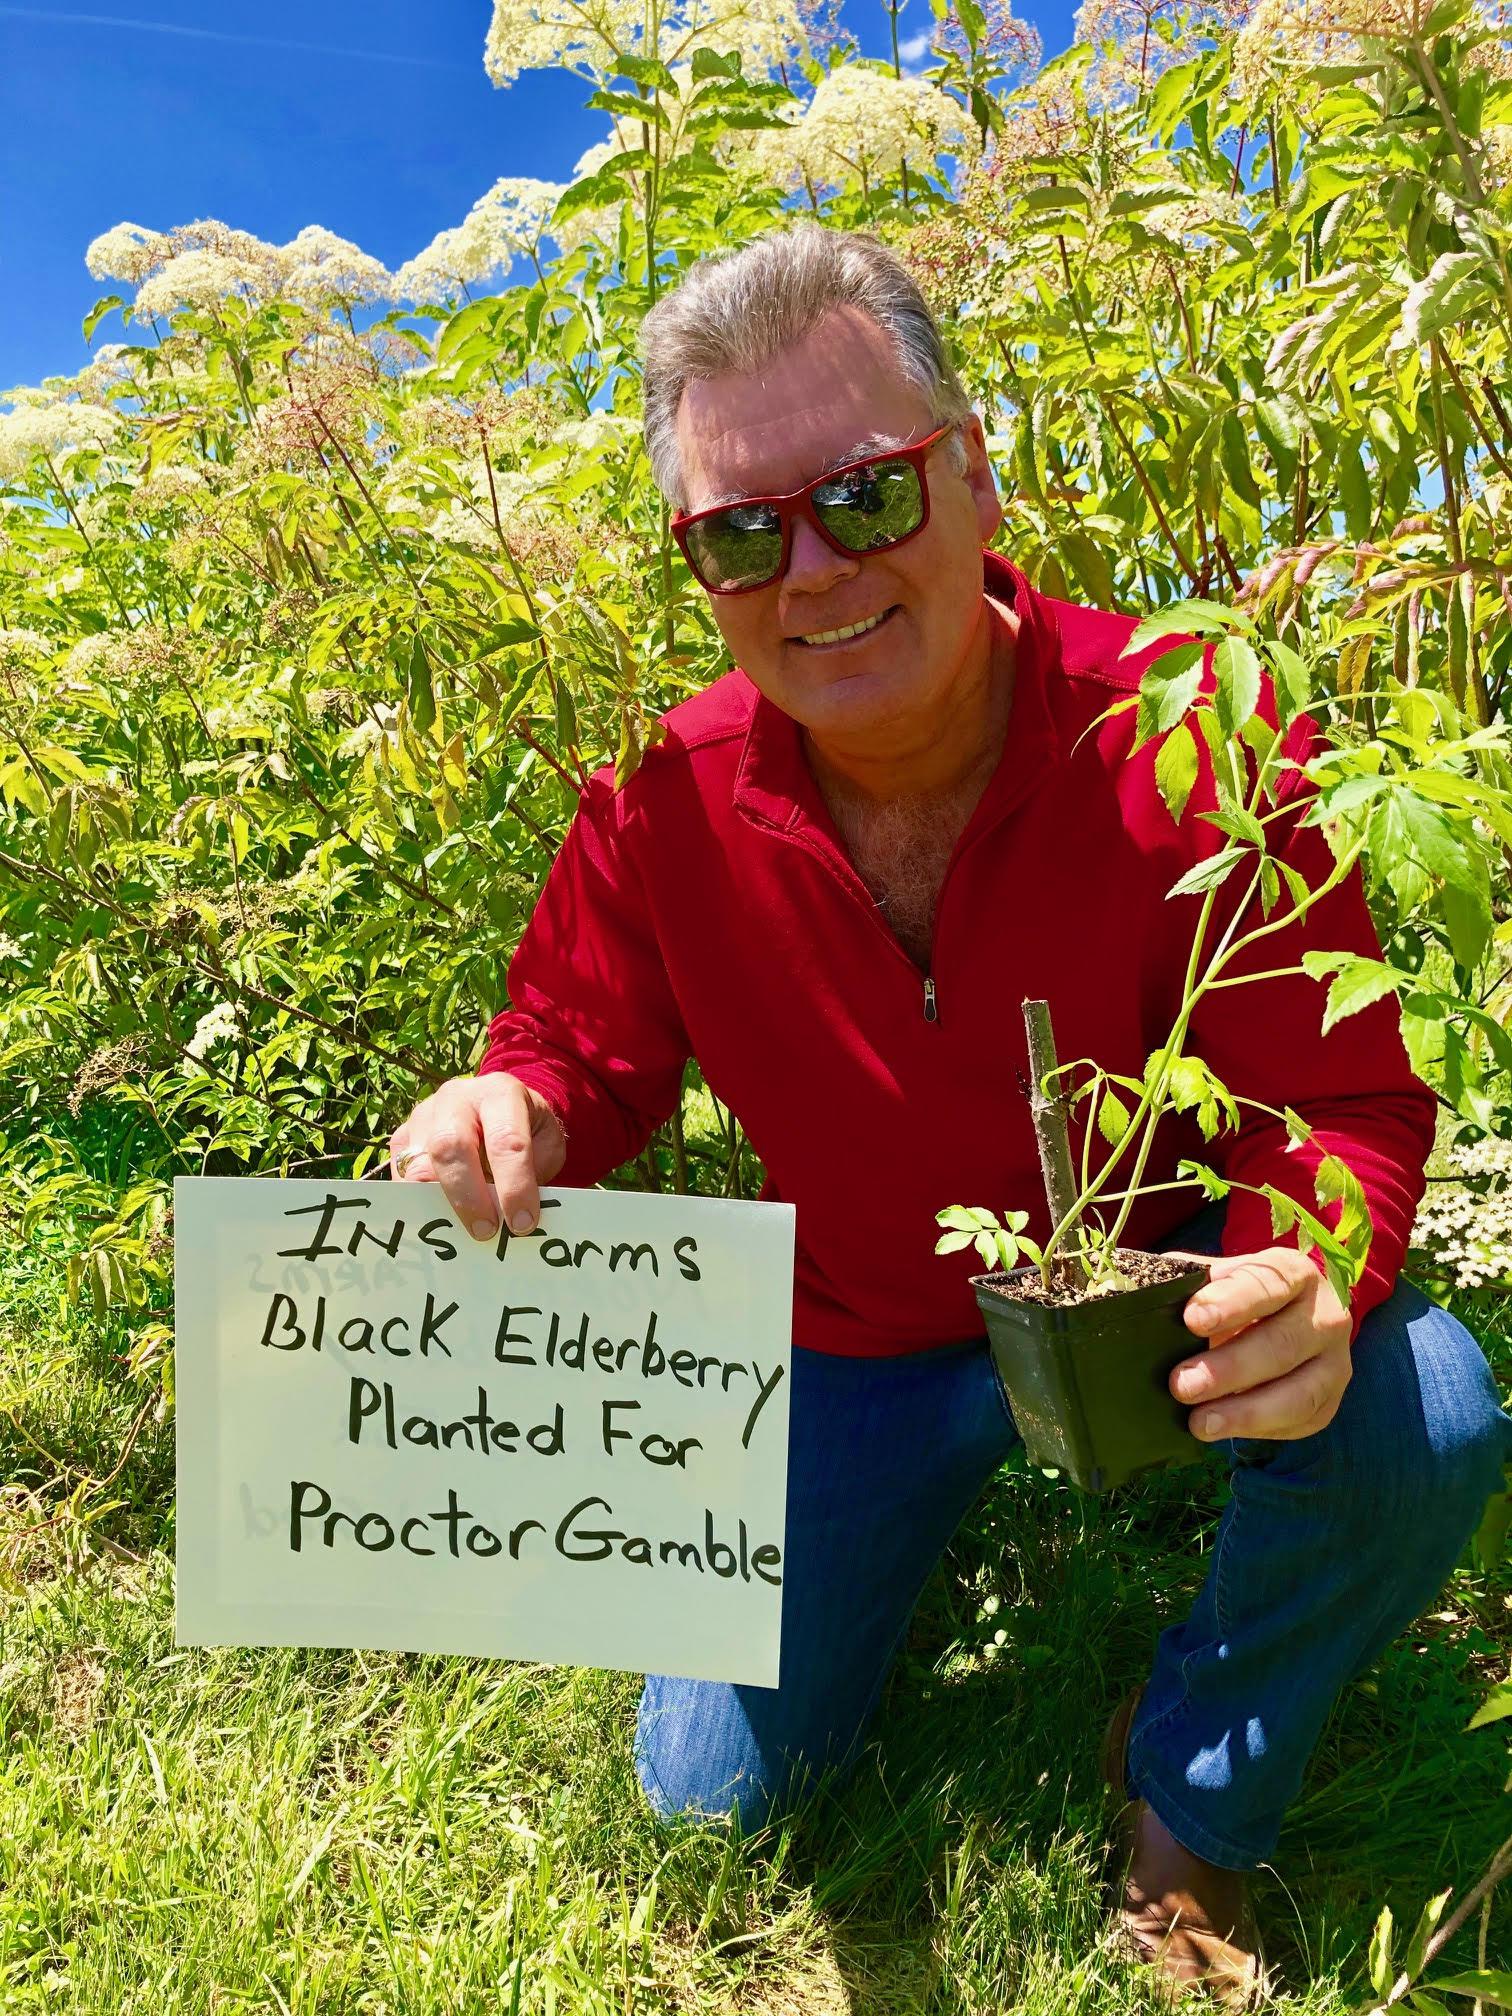 Plant-Elderberry-Proctor-Gamble.jpg